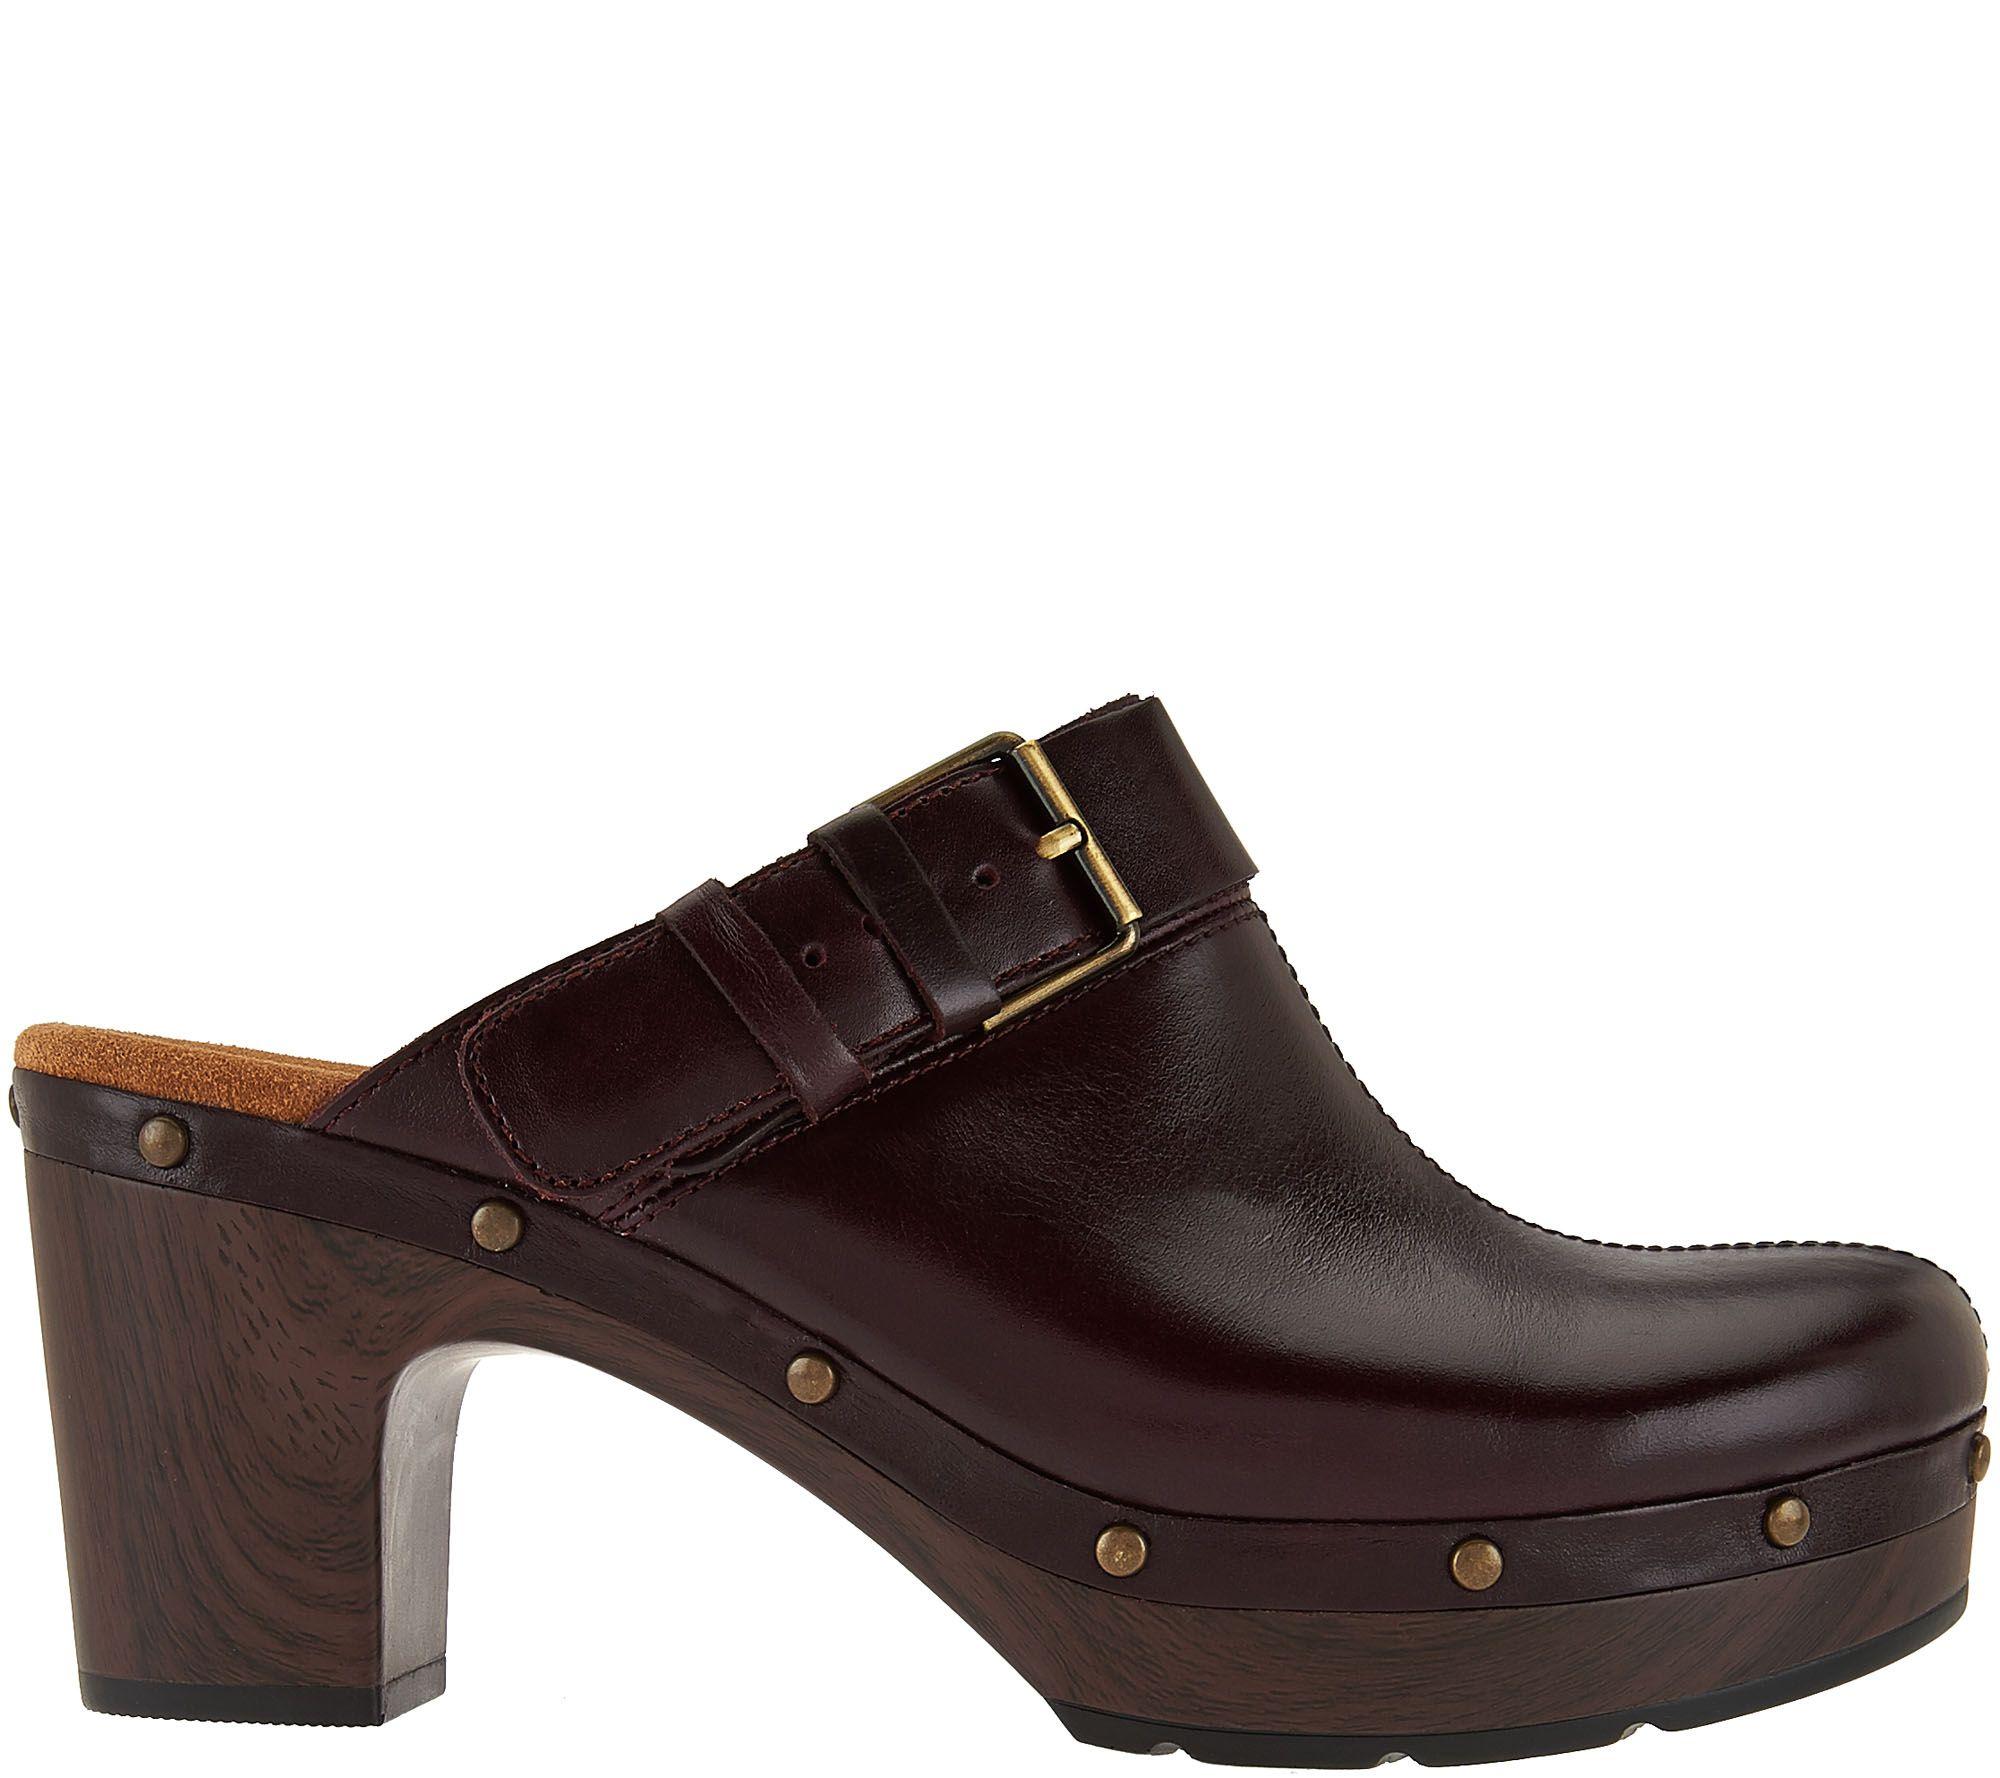 3b72aad1140c Clarks Artisan Block Heel Clogs - Ledella York - Page 1 — QVC.com